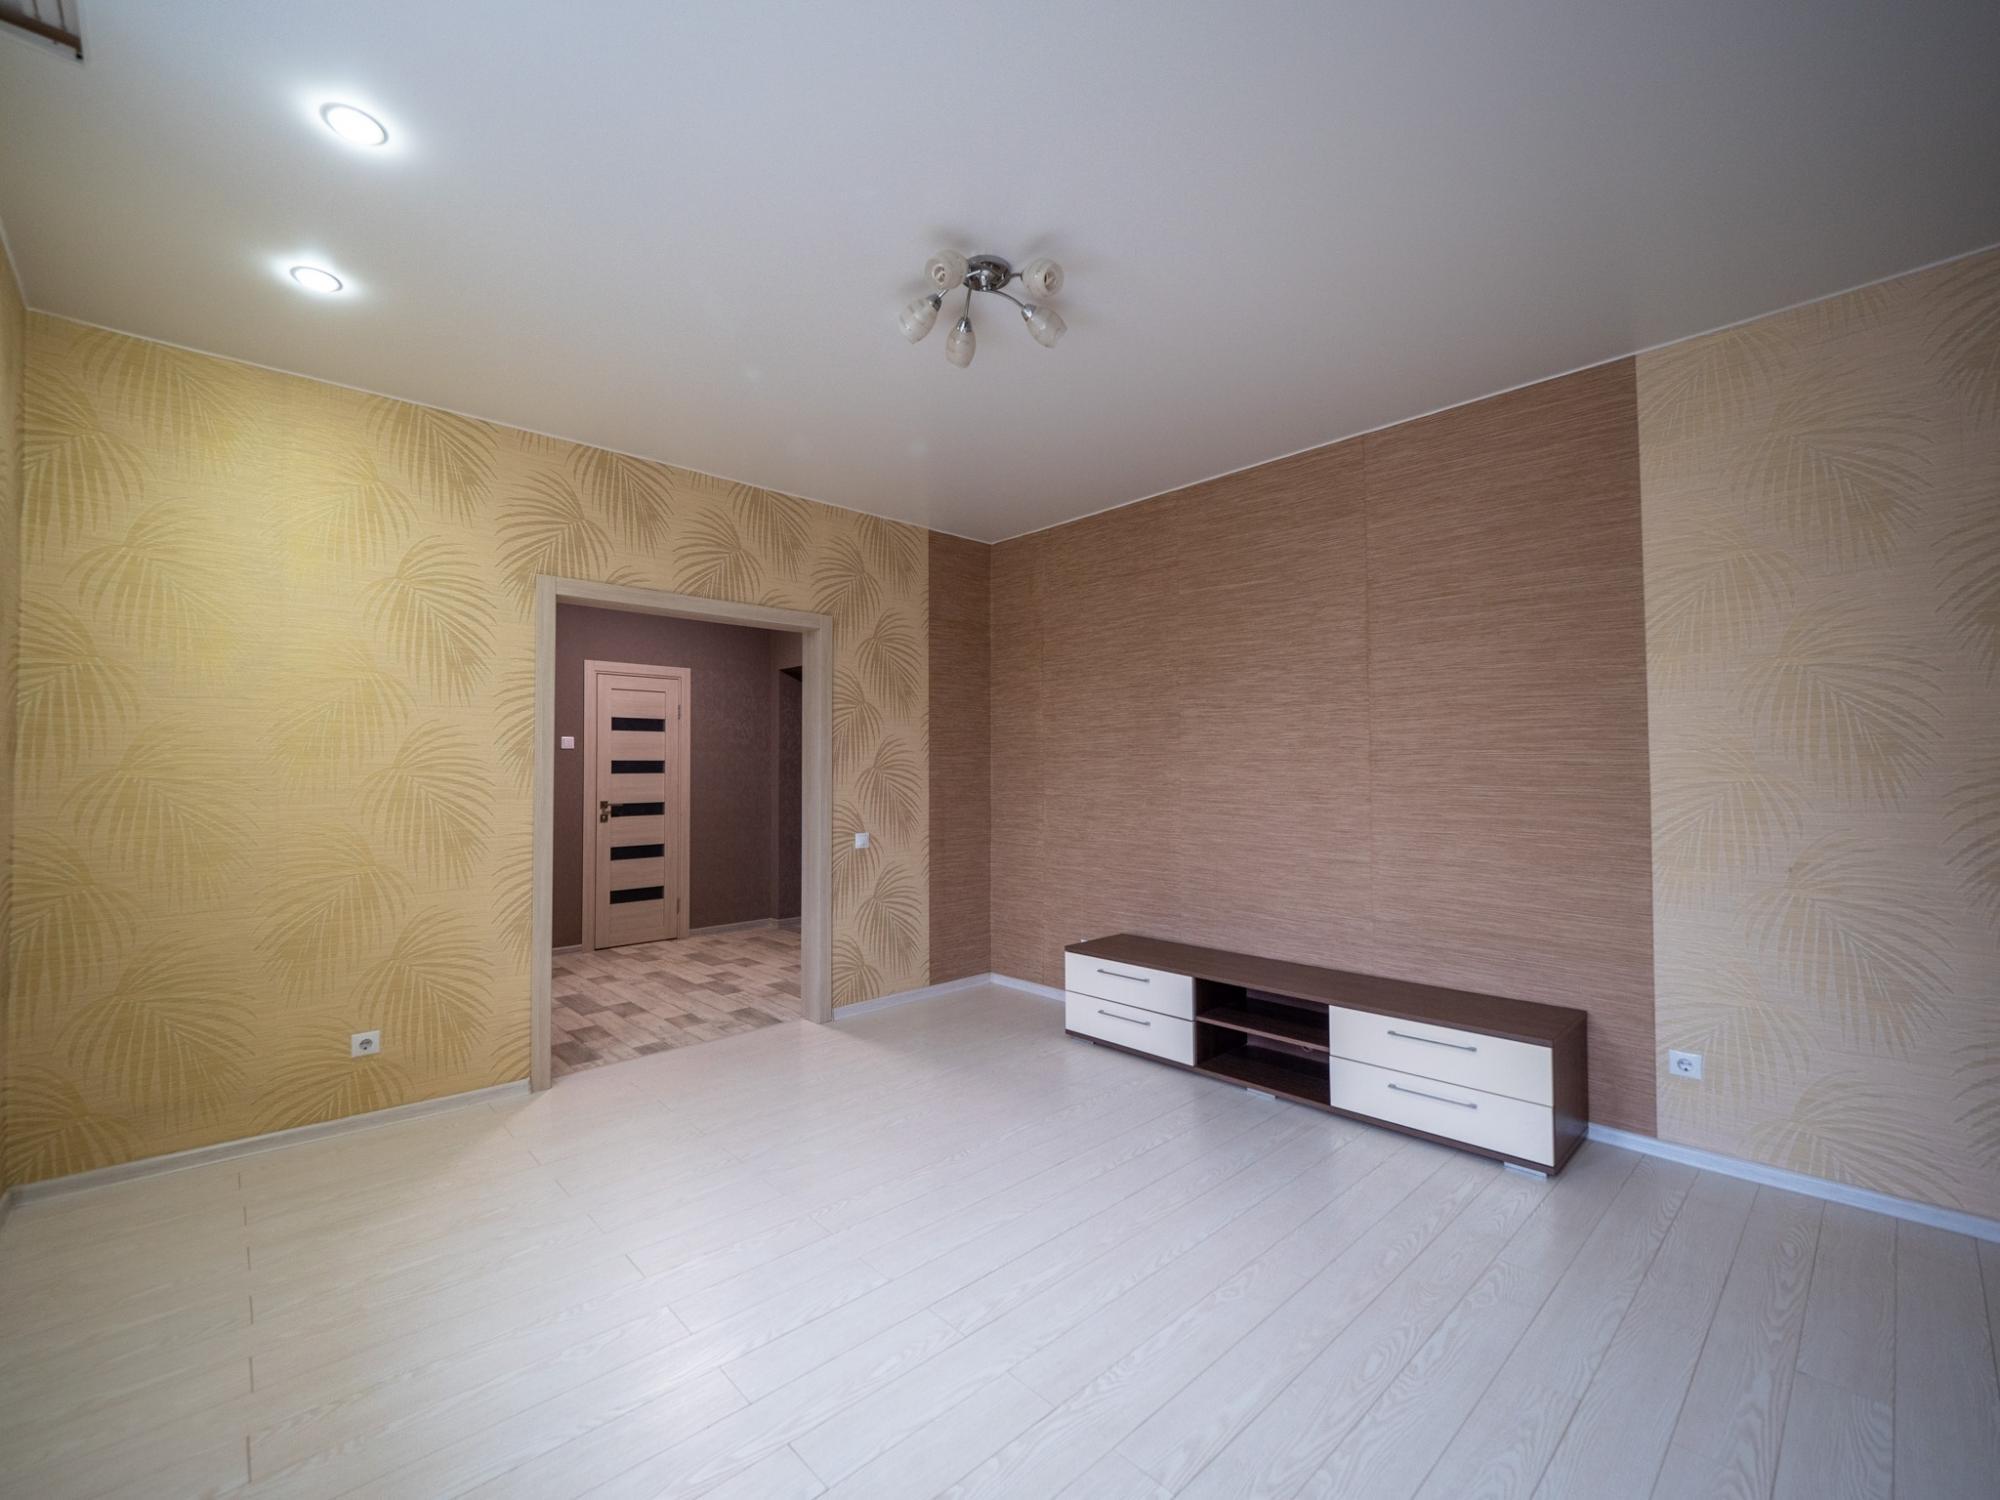 1к квартира улица Весны, 2а | 21000 | аренда в Красноярске фото 1